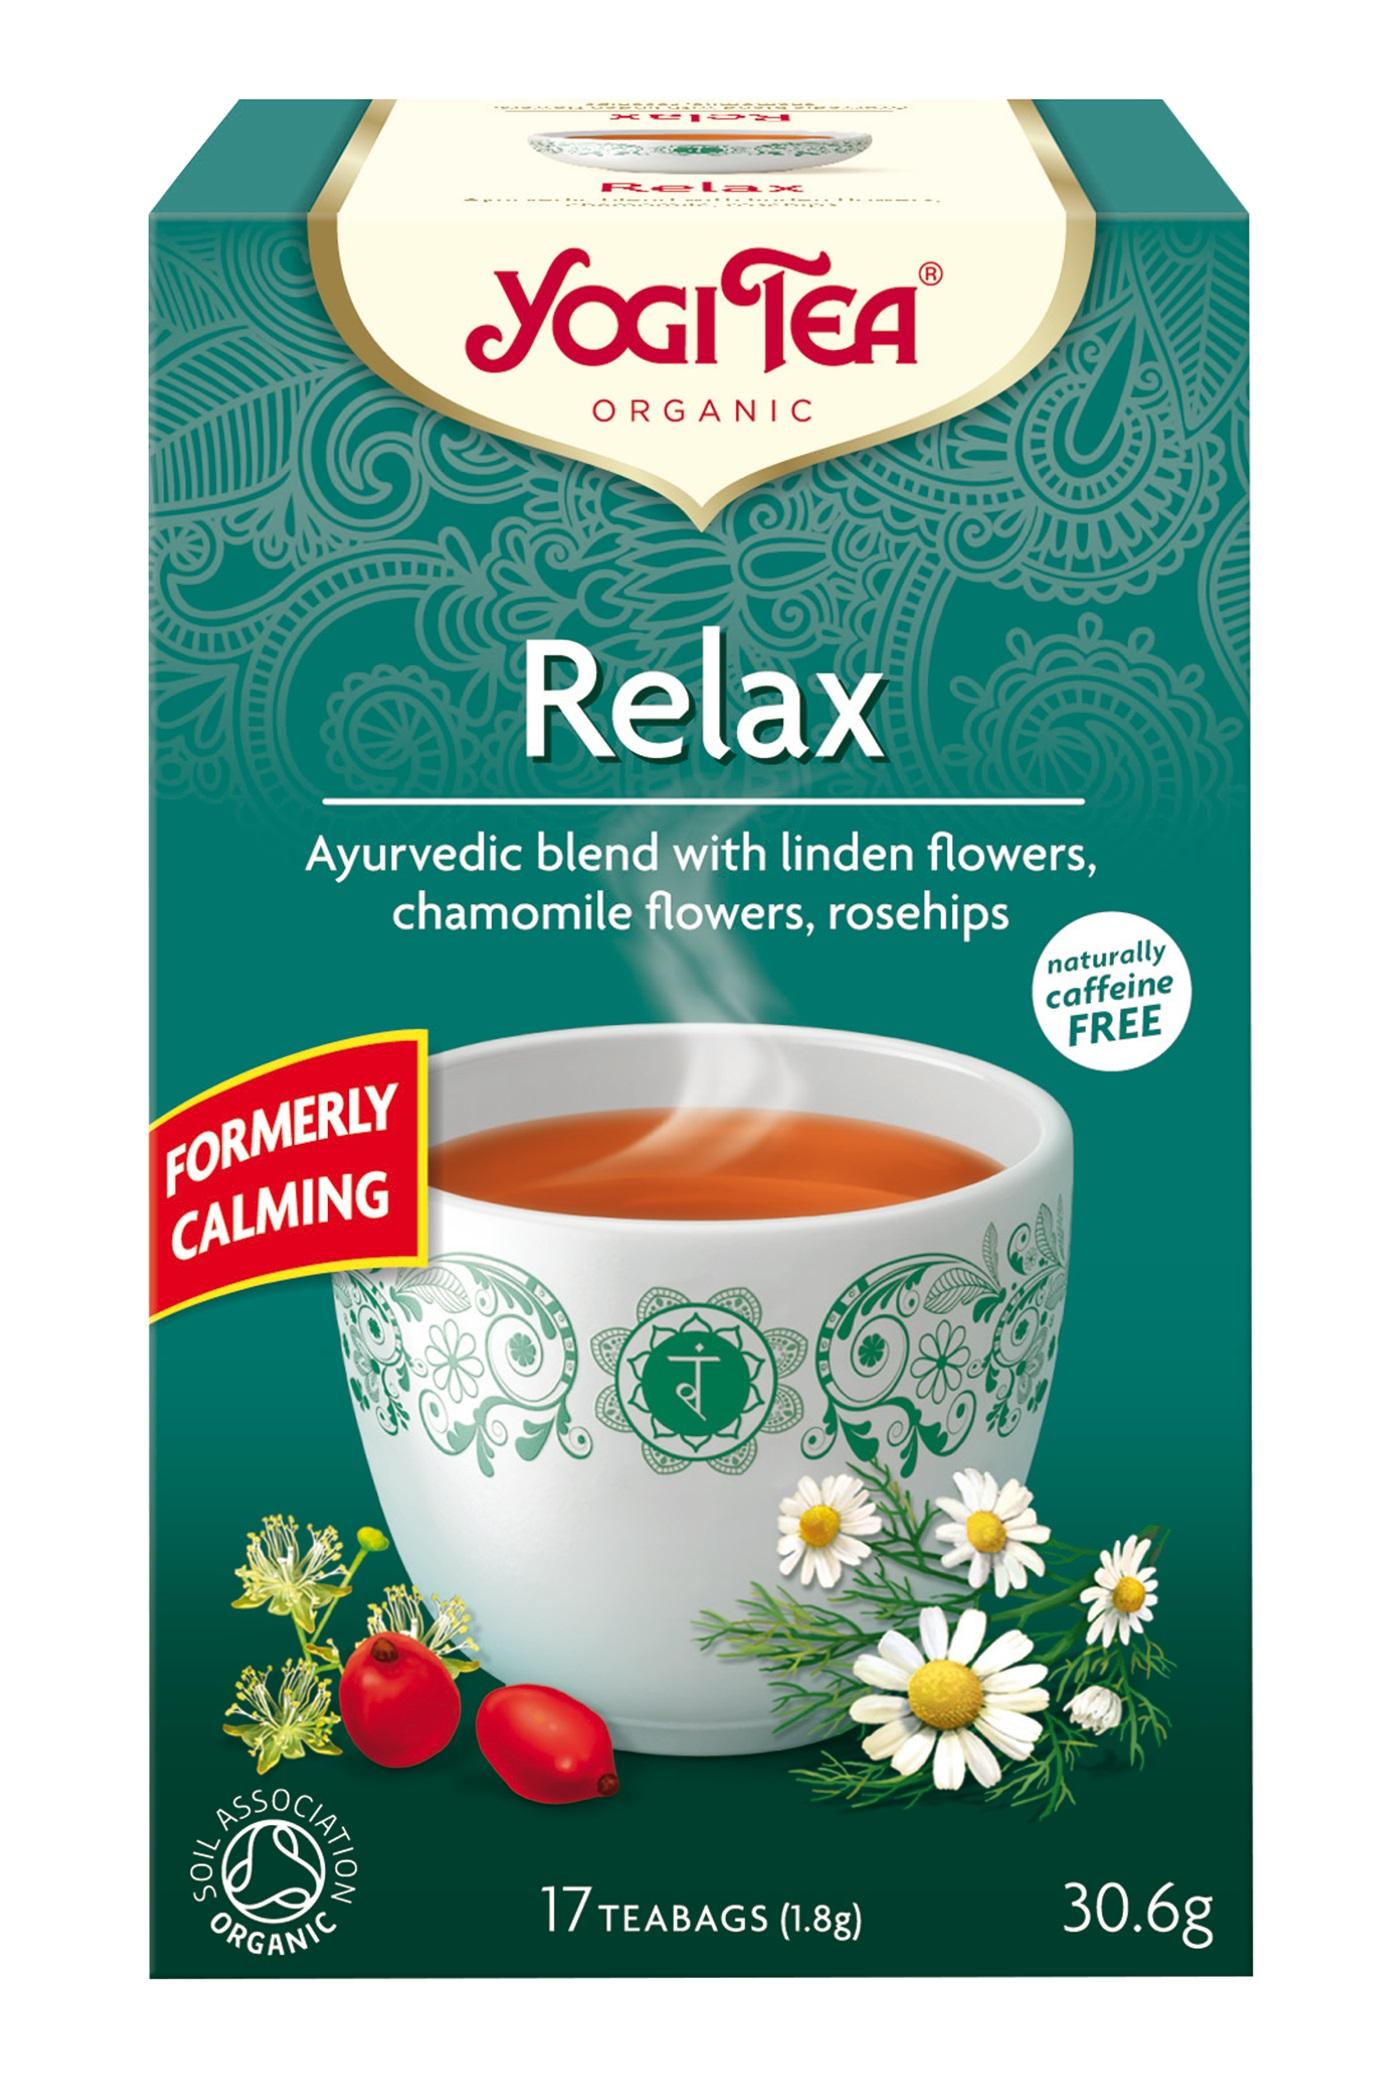 Yogi Tea Relax Tea - 17 Brev